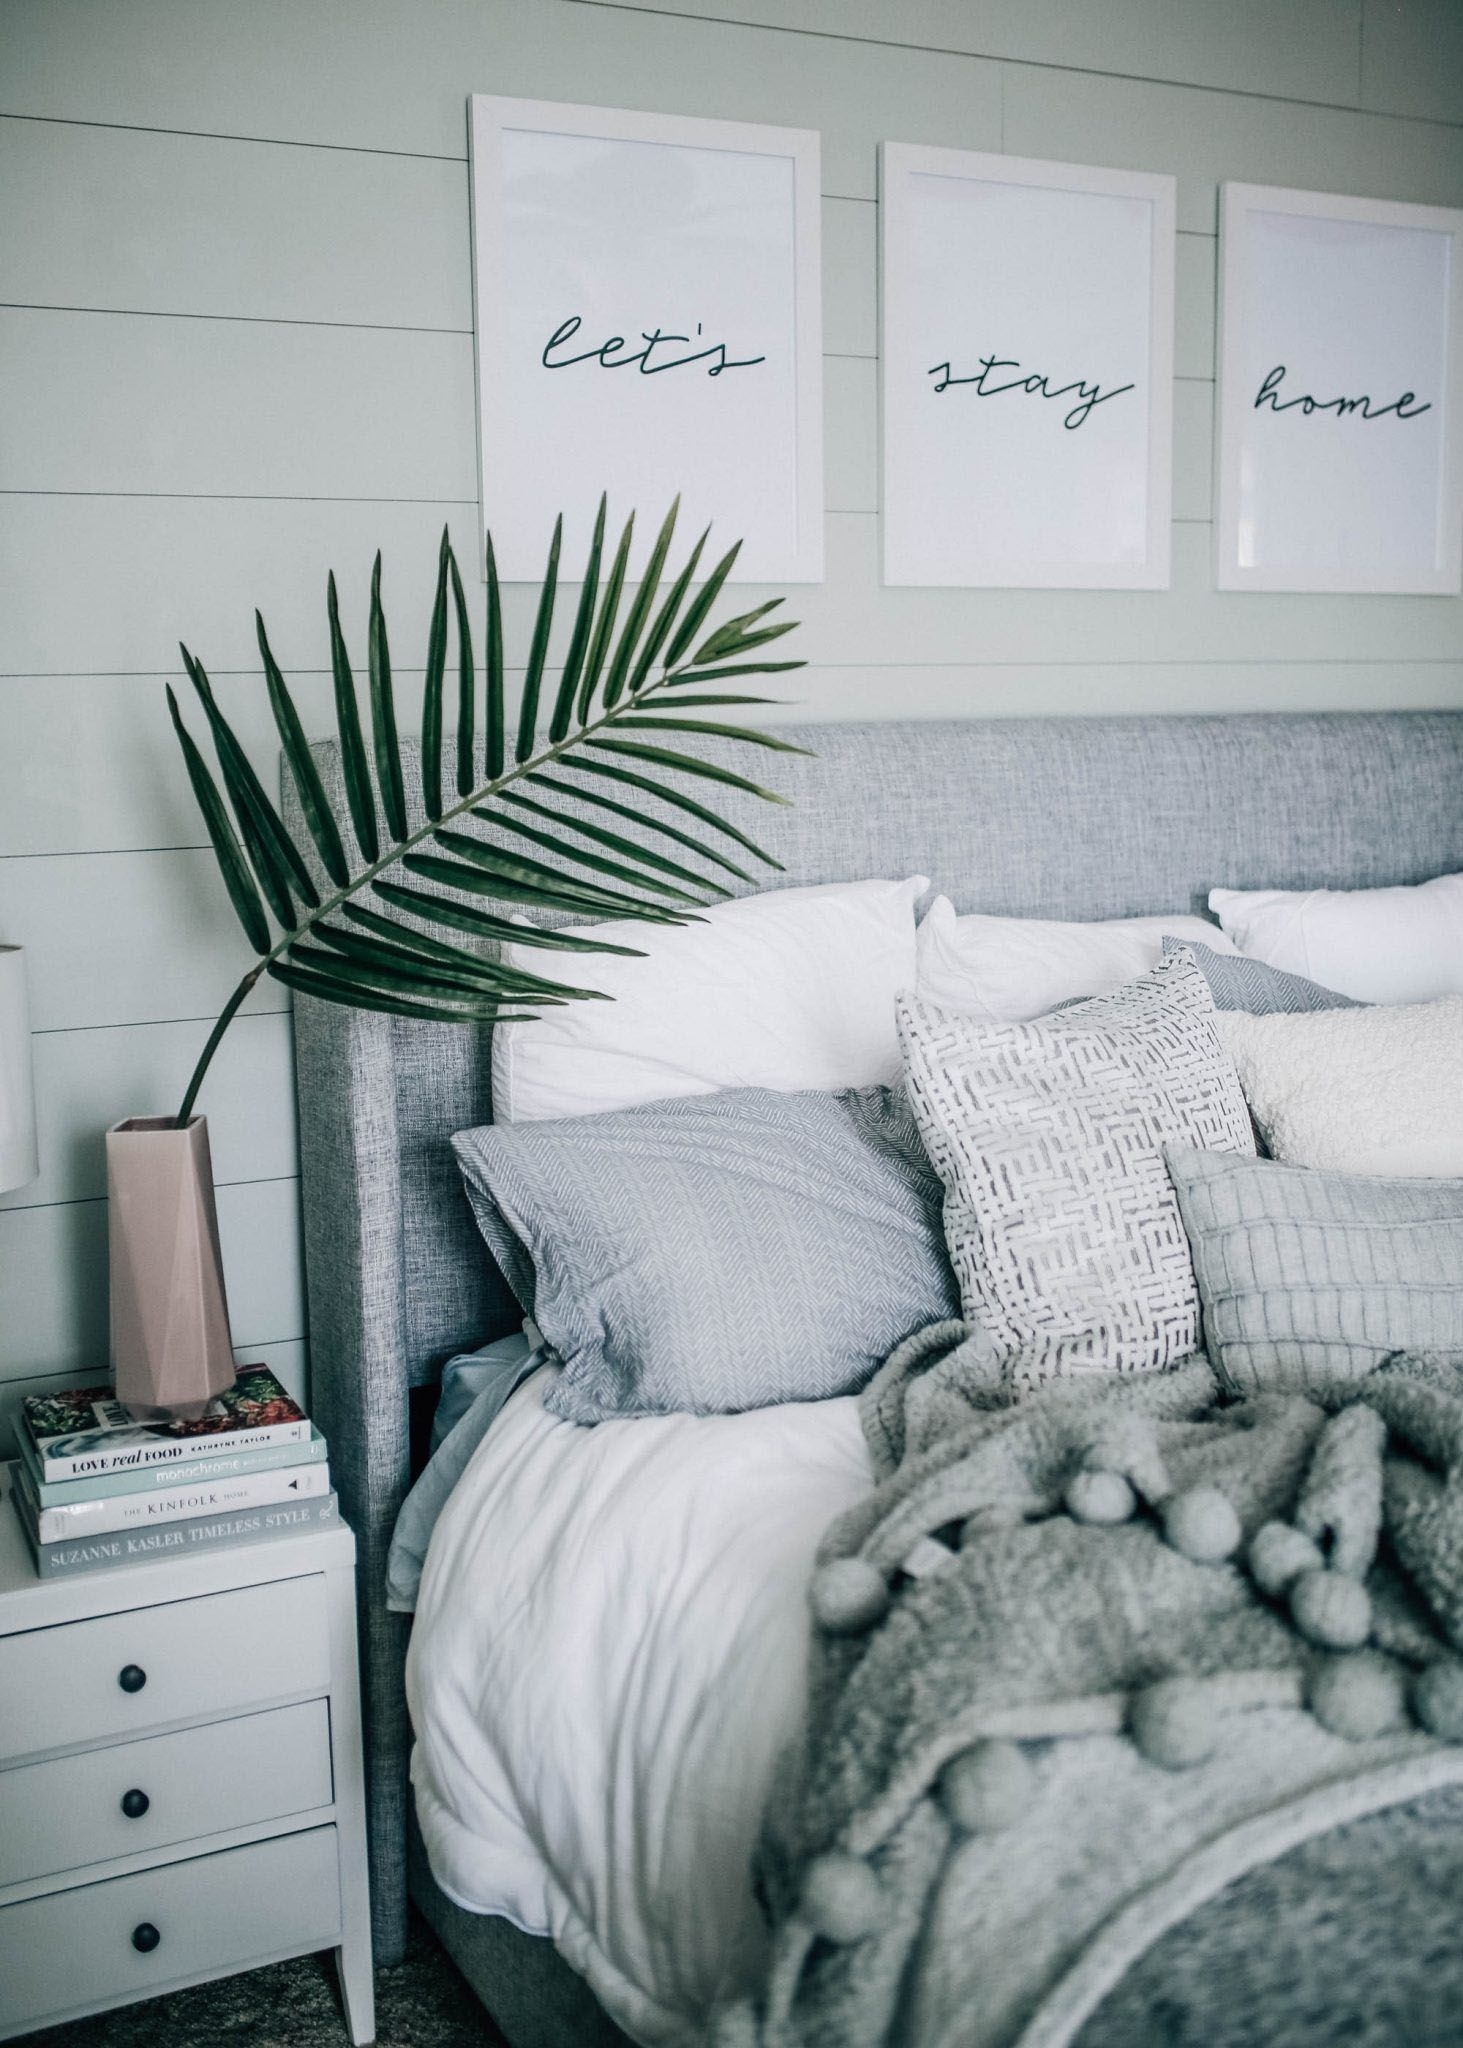 Marvelous Interior Decorating Green Grey Bedroom Ideas To Inspire You White Bedroom Decor Bedroom Decor Cozy Home Decor Bedroom Grey decor bedroom ideas